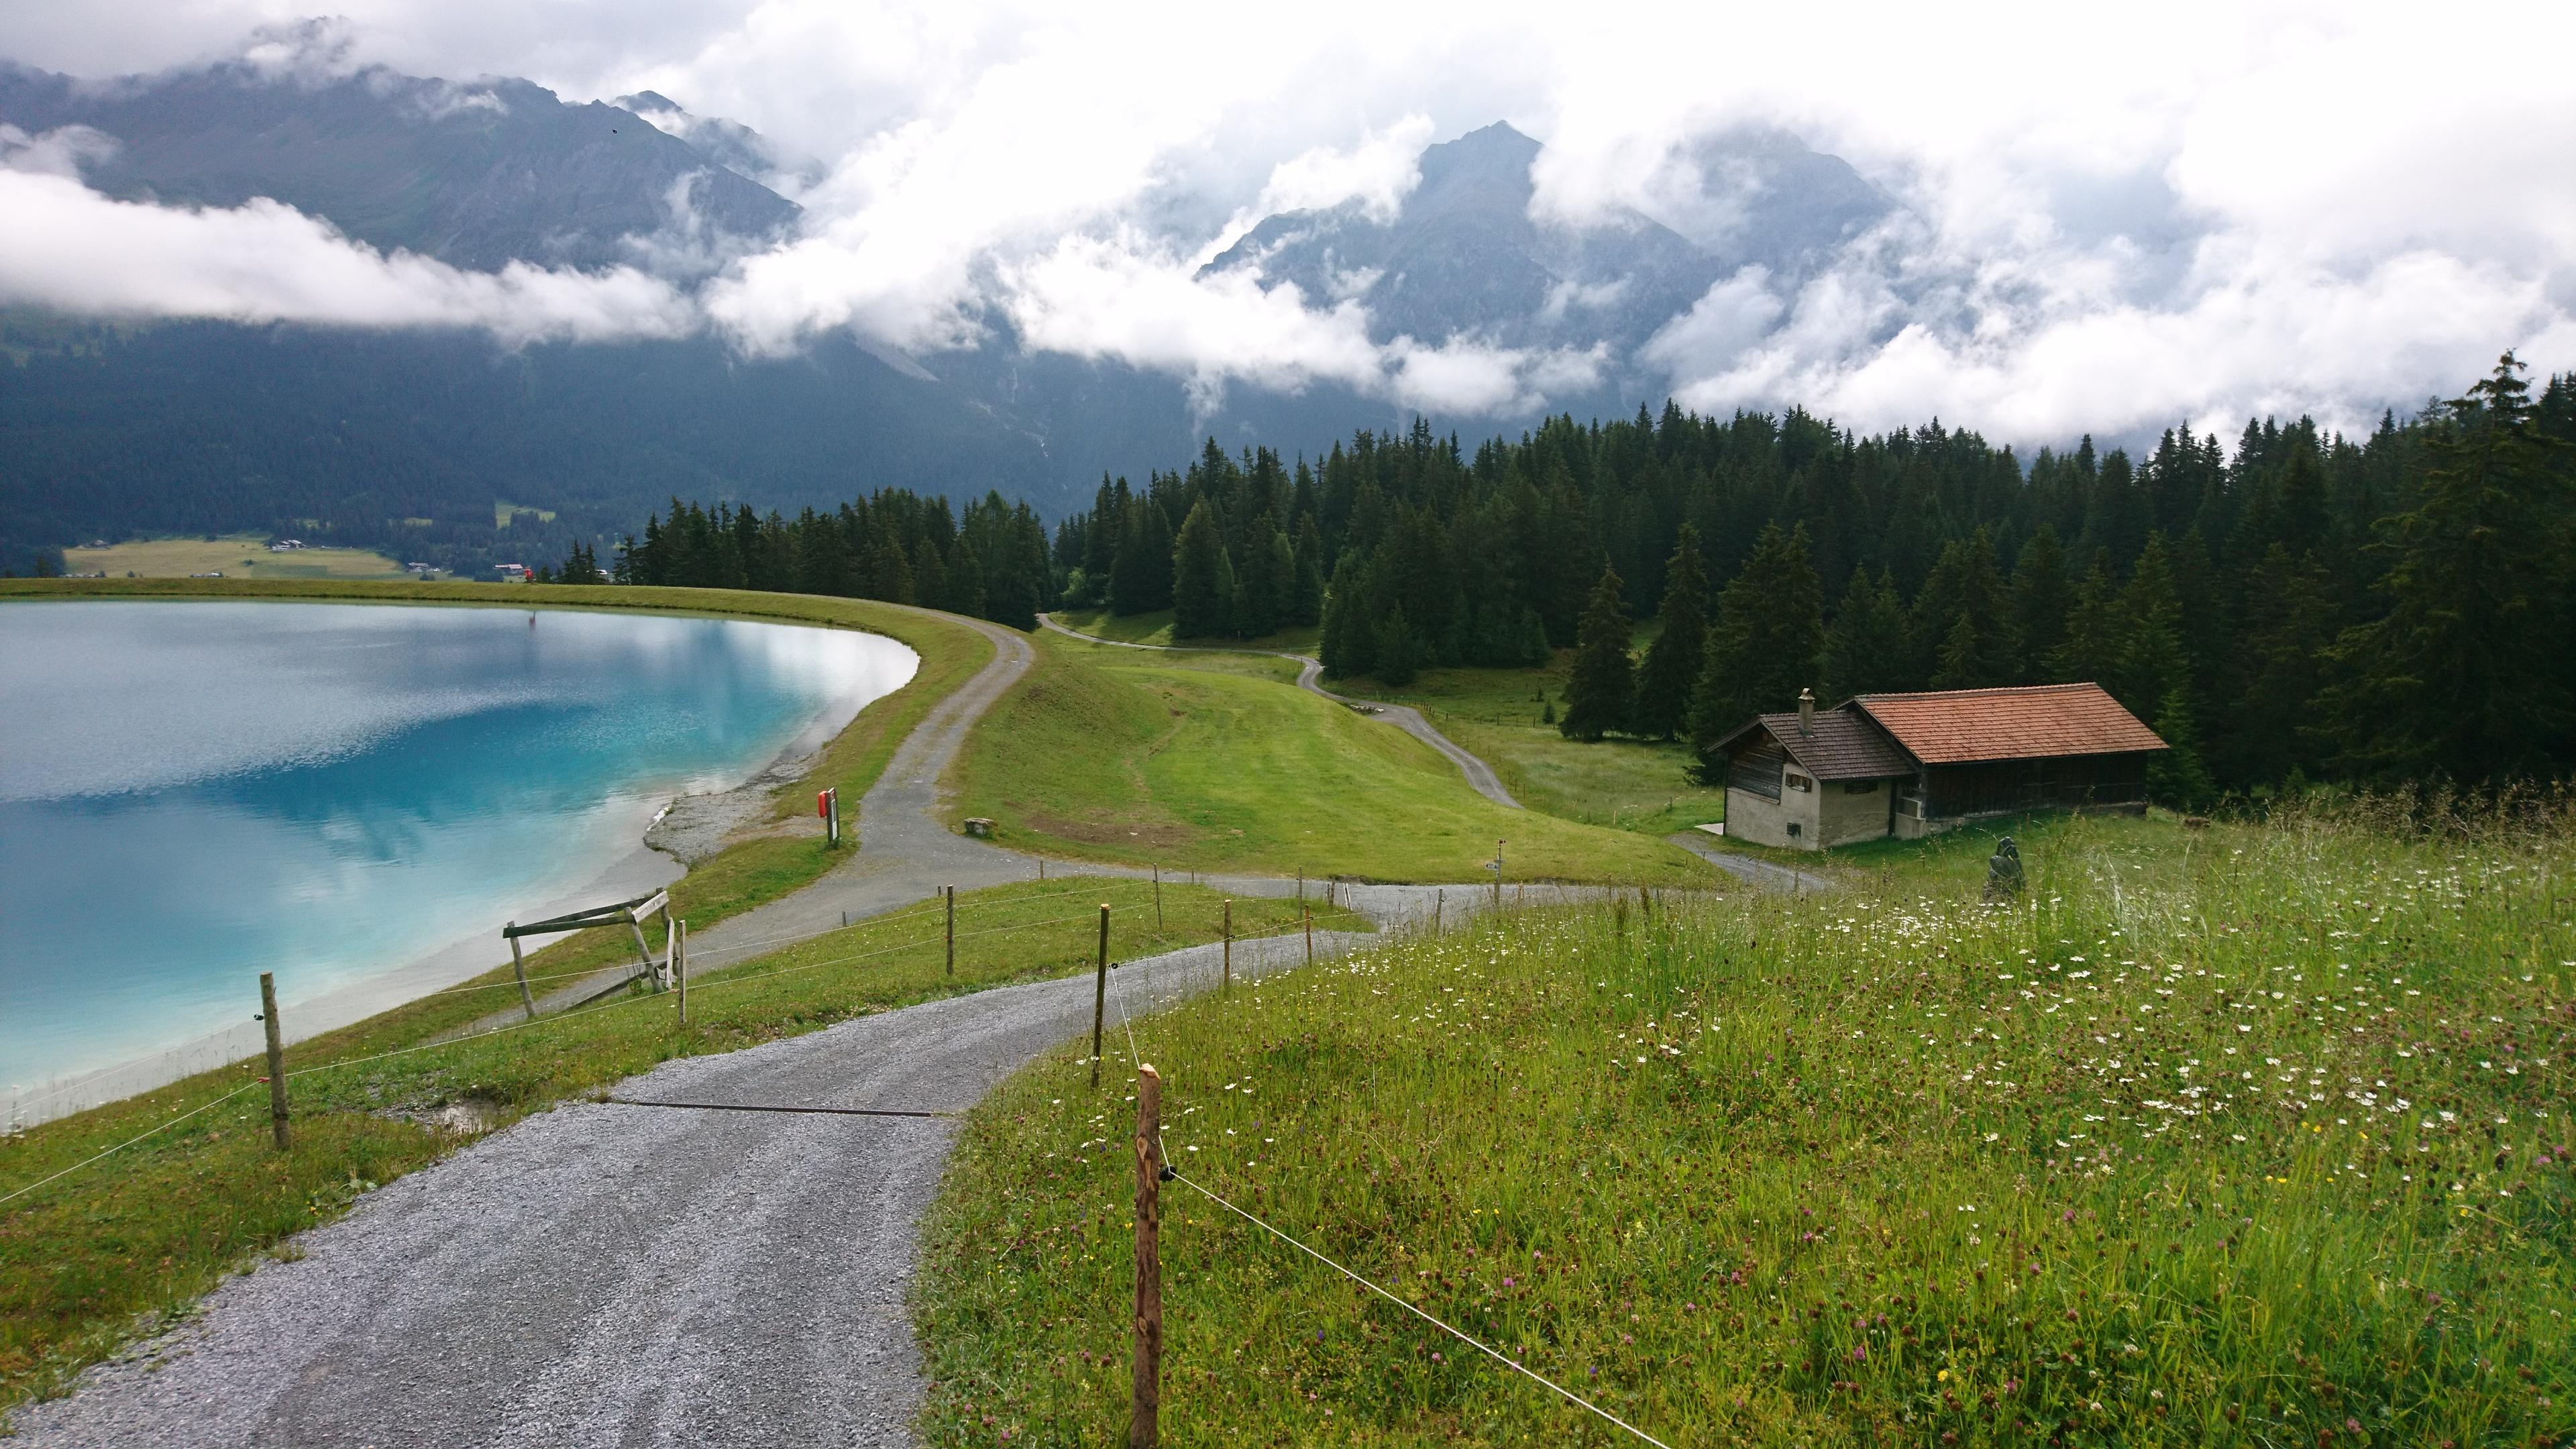 Landschaft in den Alpen, Schweiz